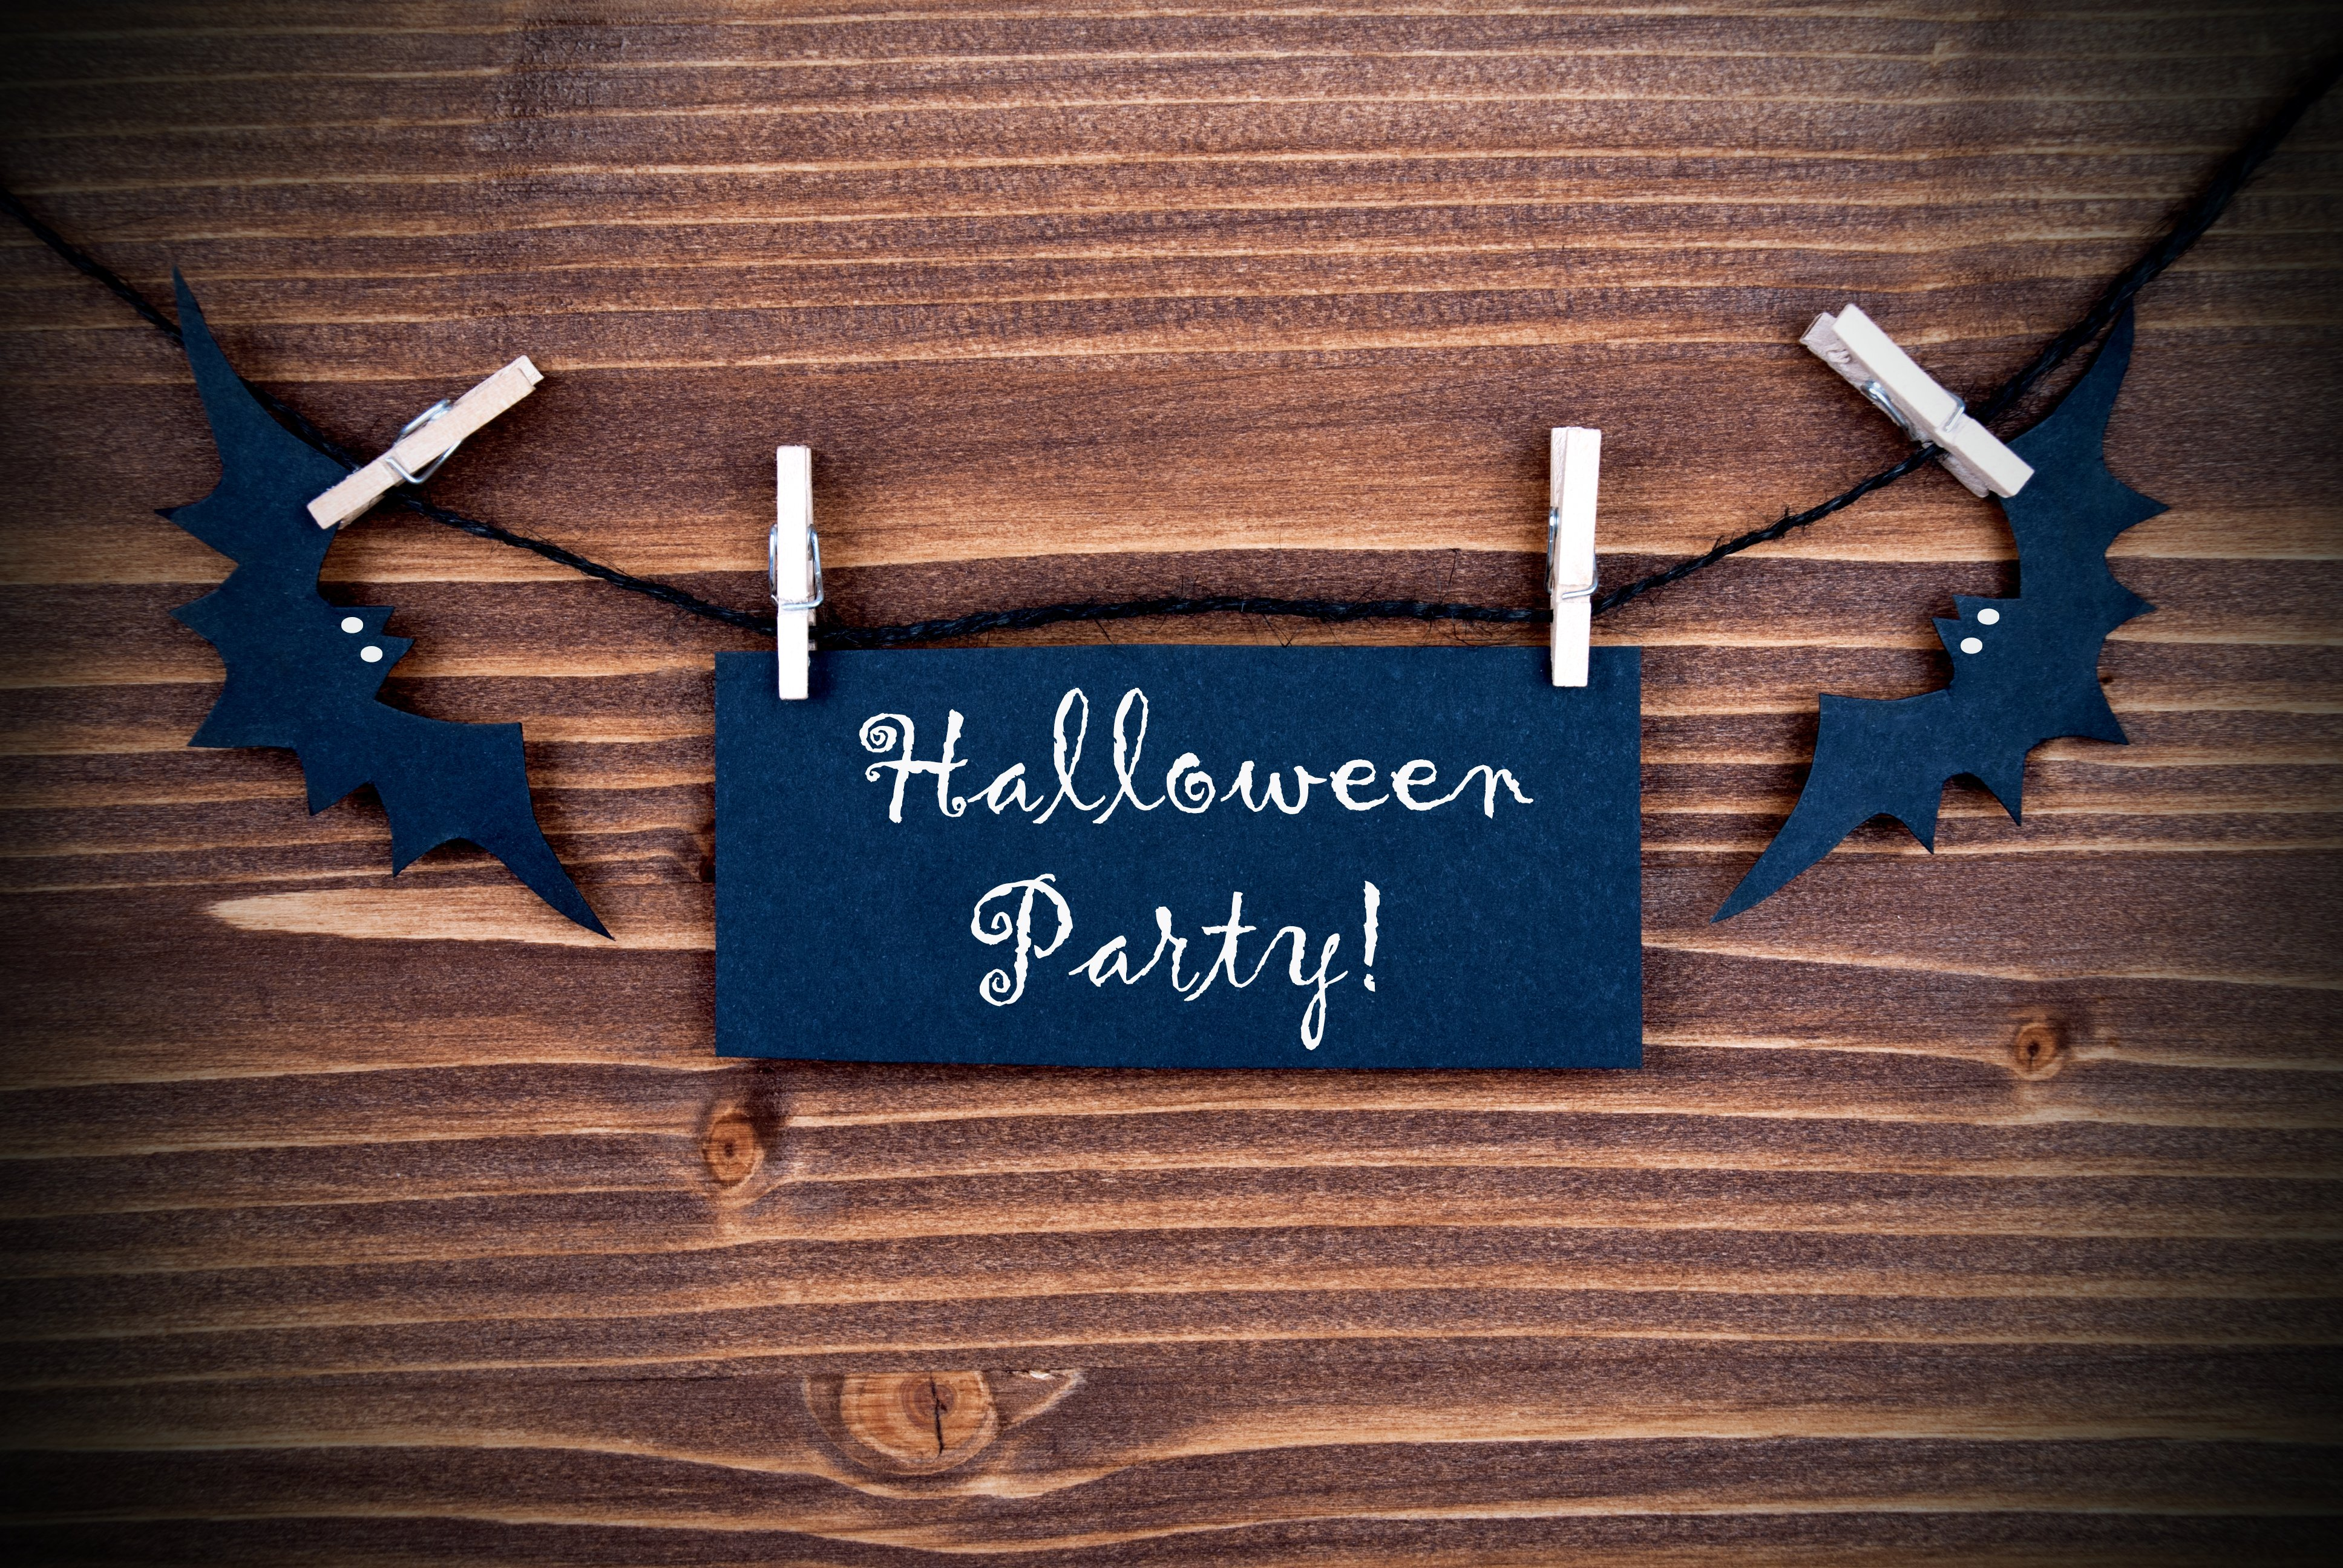 ideen f r halloween einladungen halloween party tipps. Black Bedroom Furniture Sets. Home Design Ideas